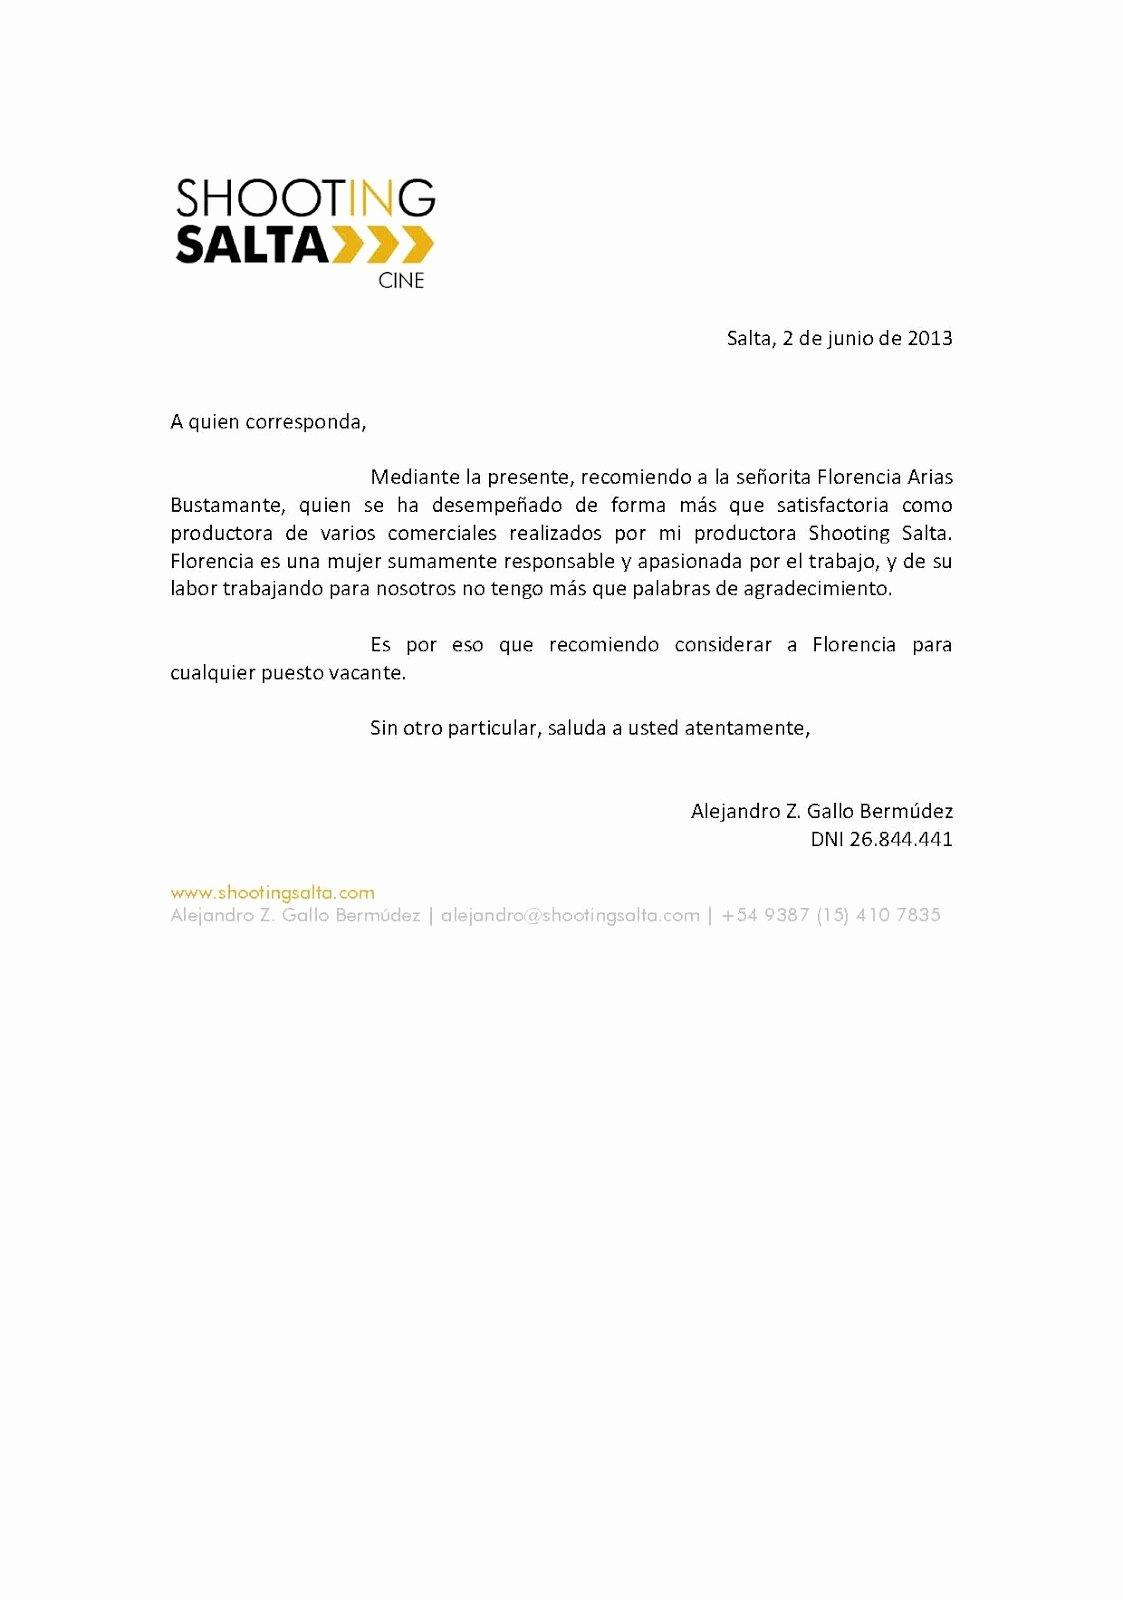 John Nash Letter Of Recommendation Elegant Carta De Re Endacin Personal O Hacerla Con Ejemplos